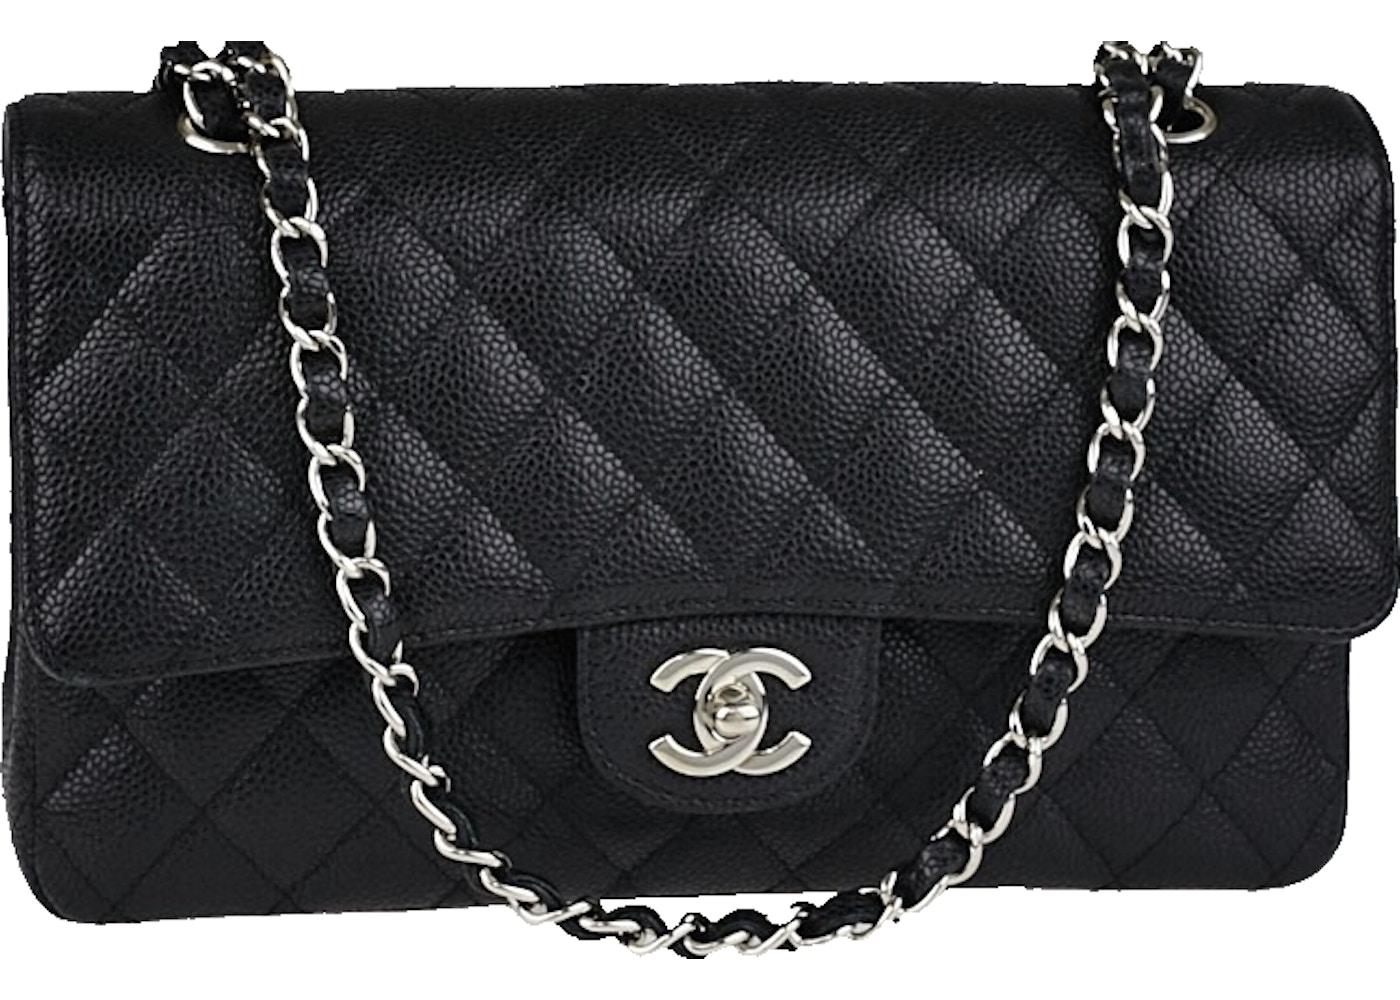 0e5751784545 Buy & Sell Luxury Handbags